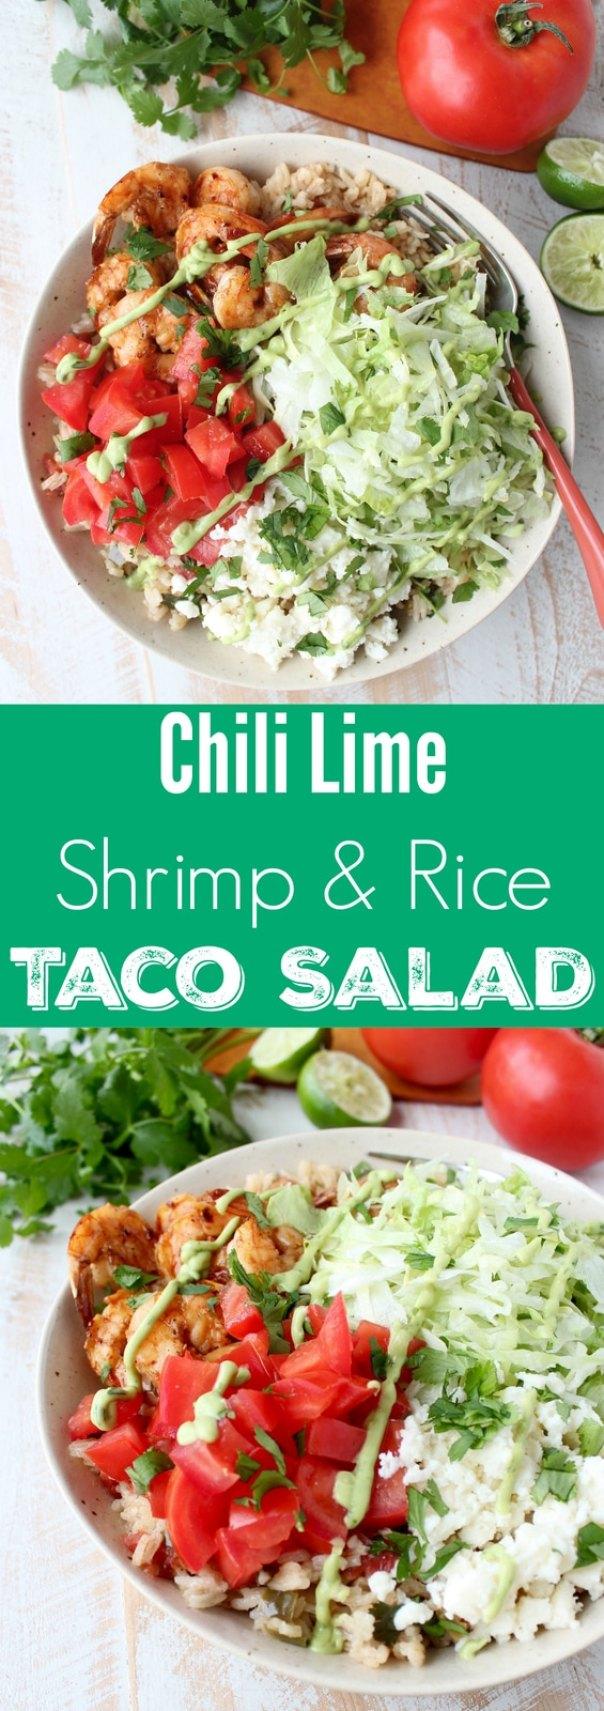 Chili Lime Shrimp & Rice Taco Salad Recipe